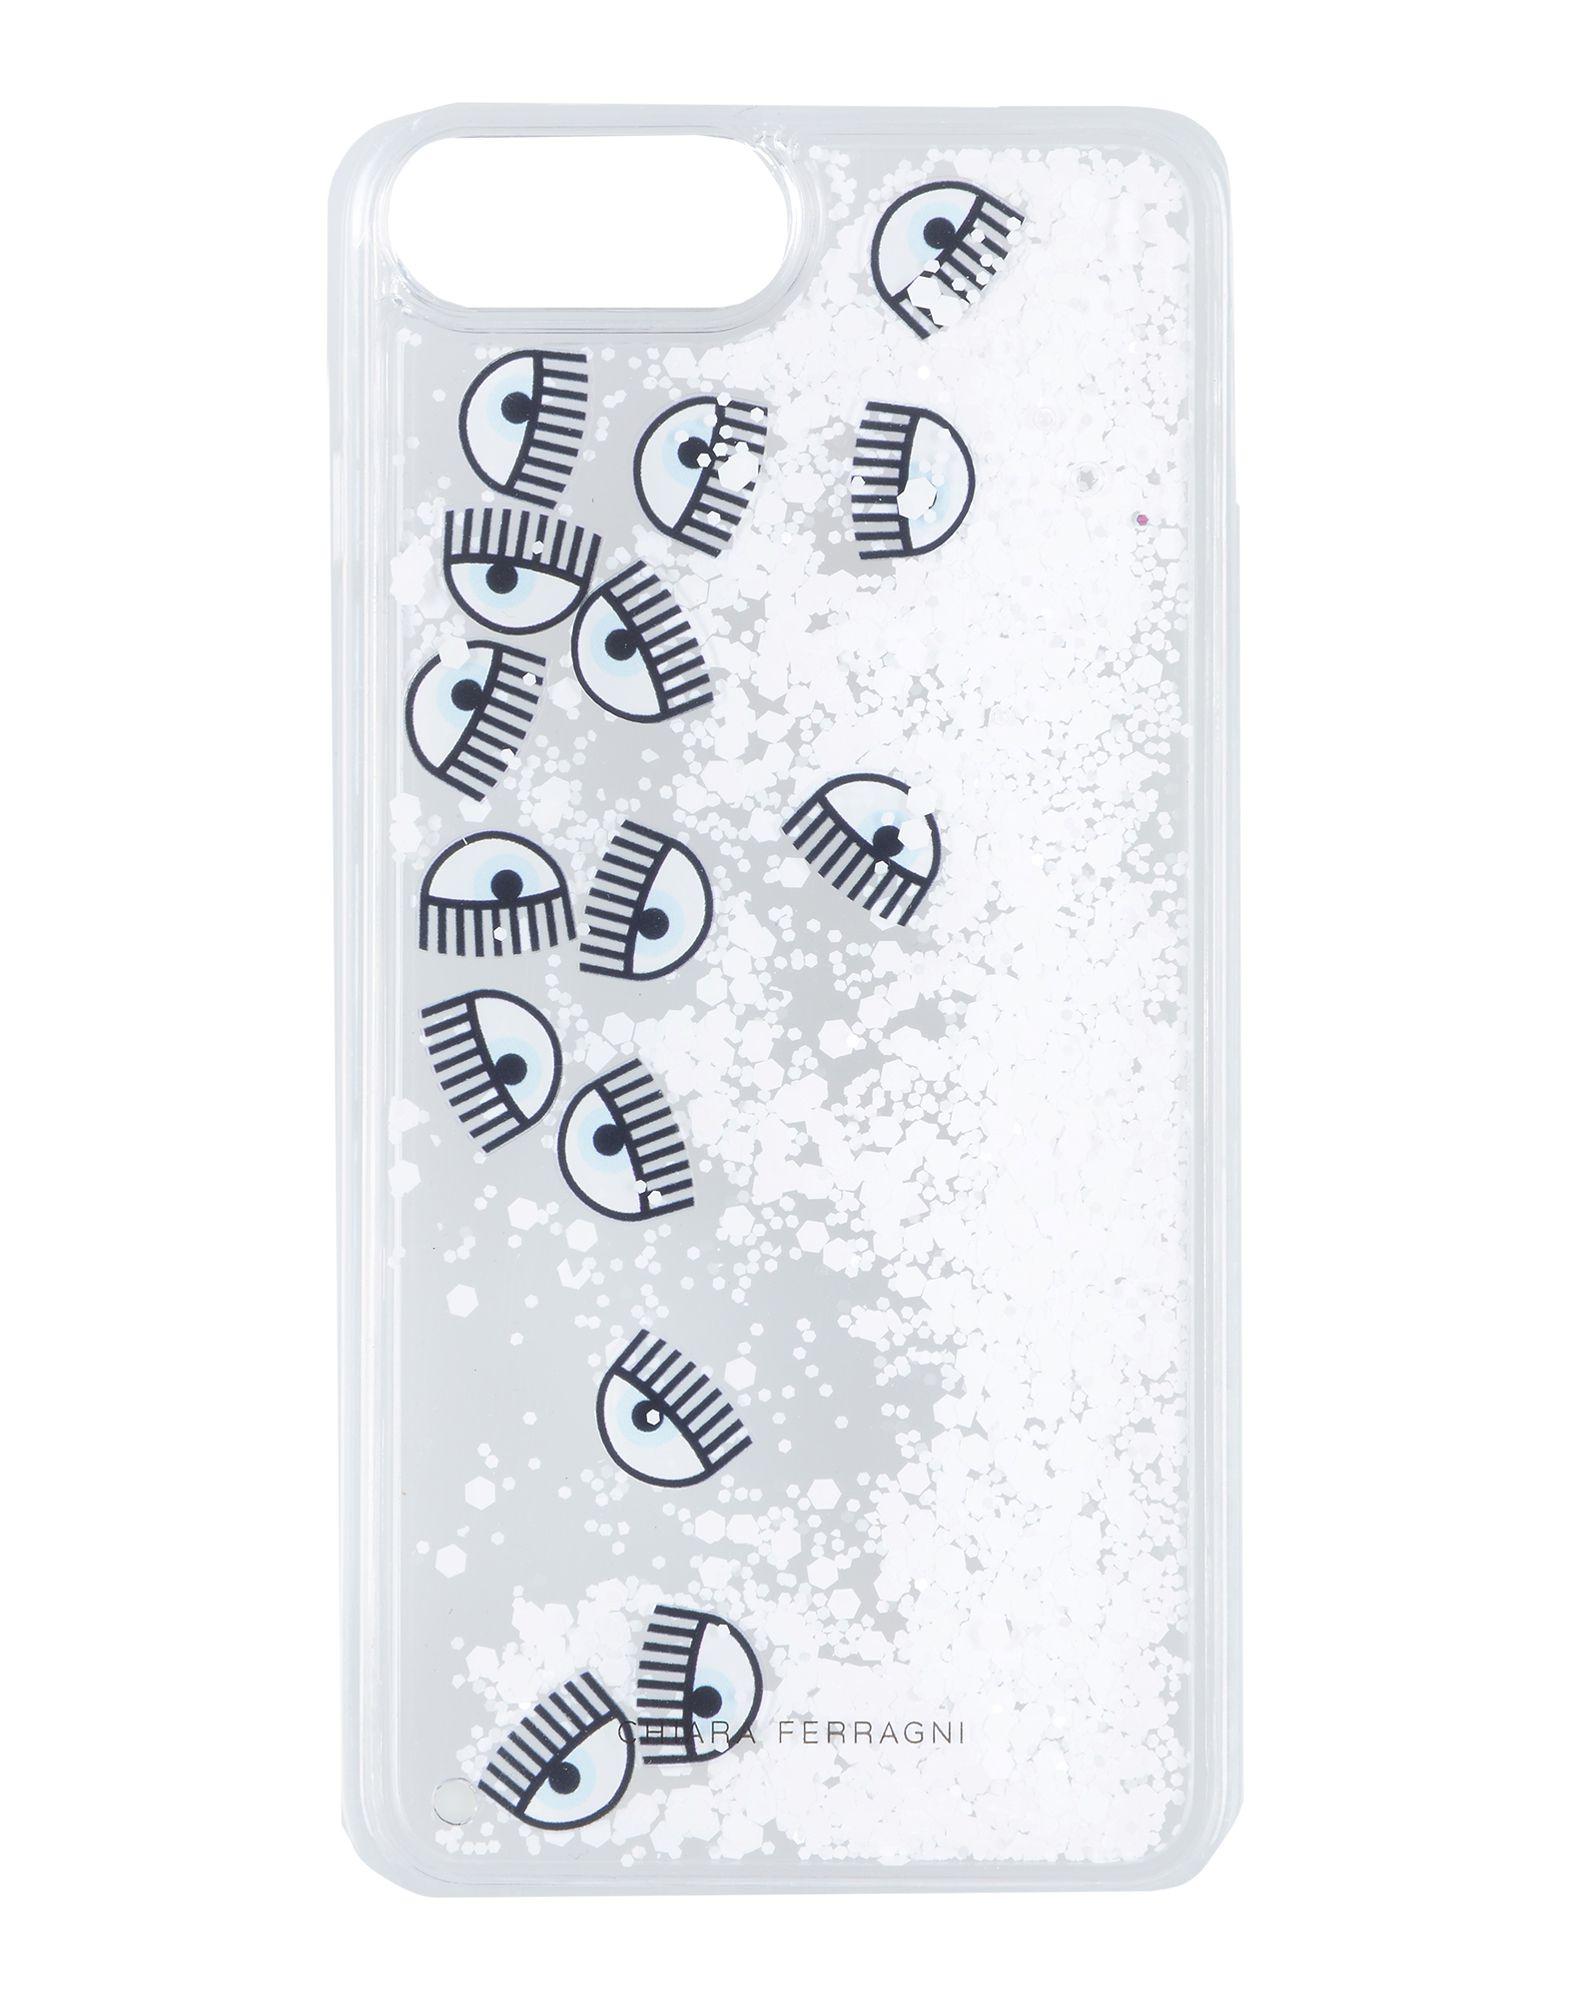 CHIARA FERRAGNI Чехол чехол крышка rf brown marble glossy для iphone 7 plus коричневый